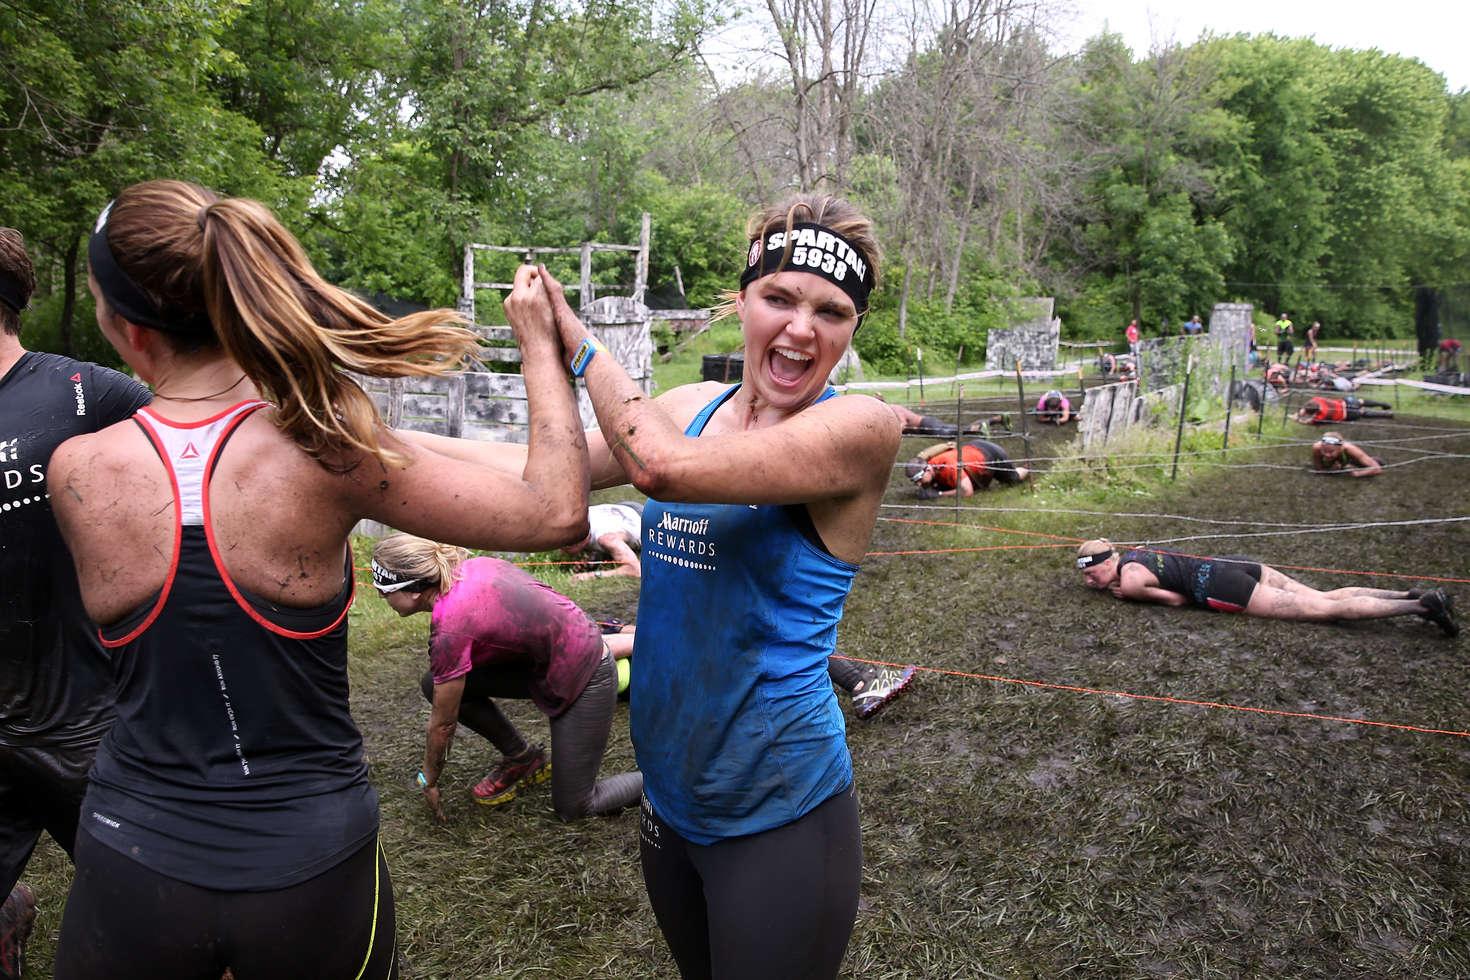 Aimee Teegarden 2016 : Aimee Teegarden: Competing in the Spartan Super Race -05